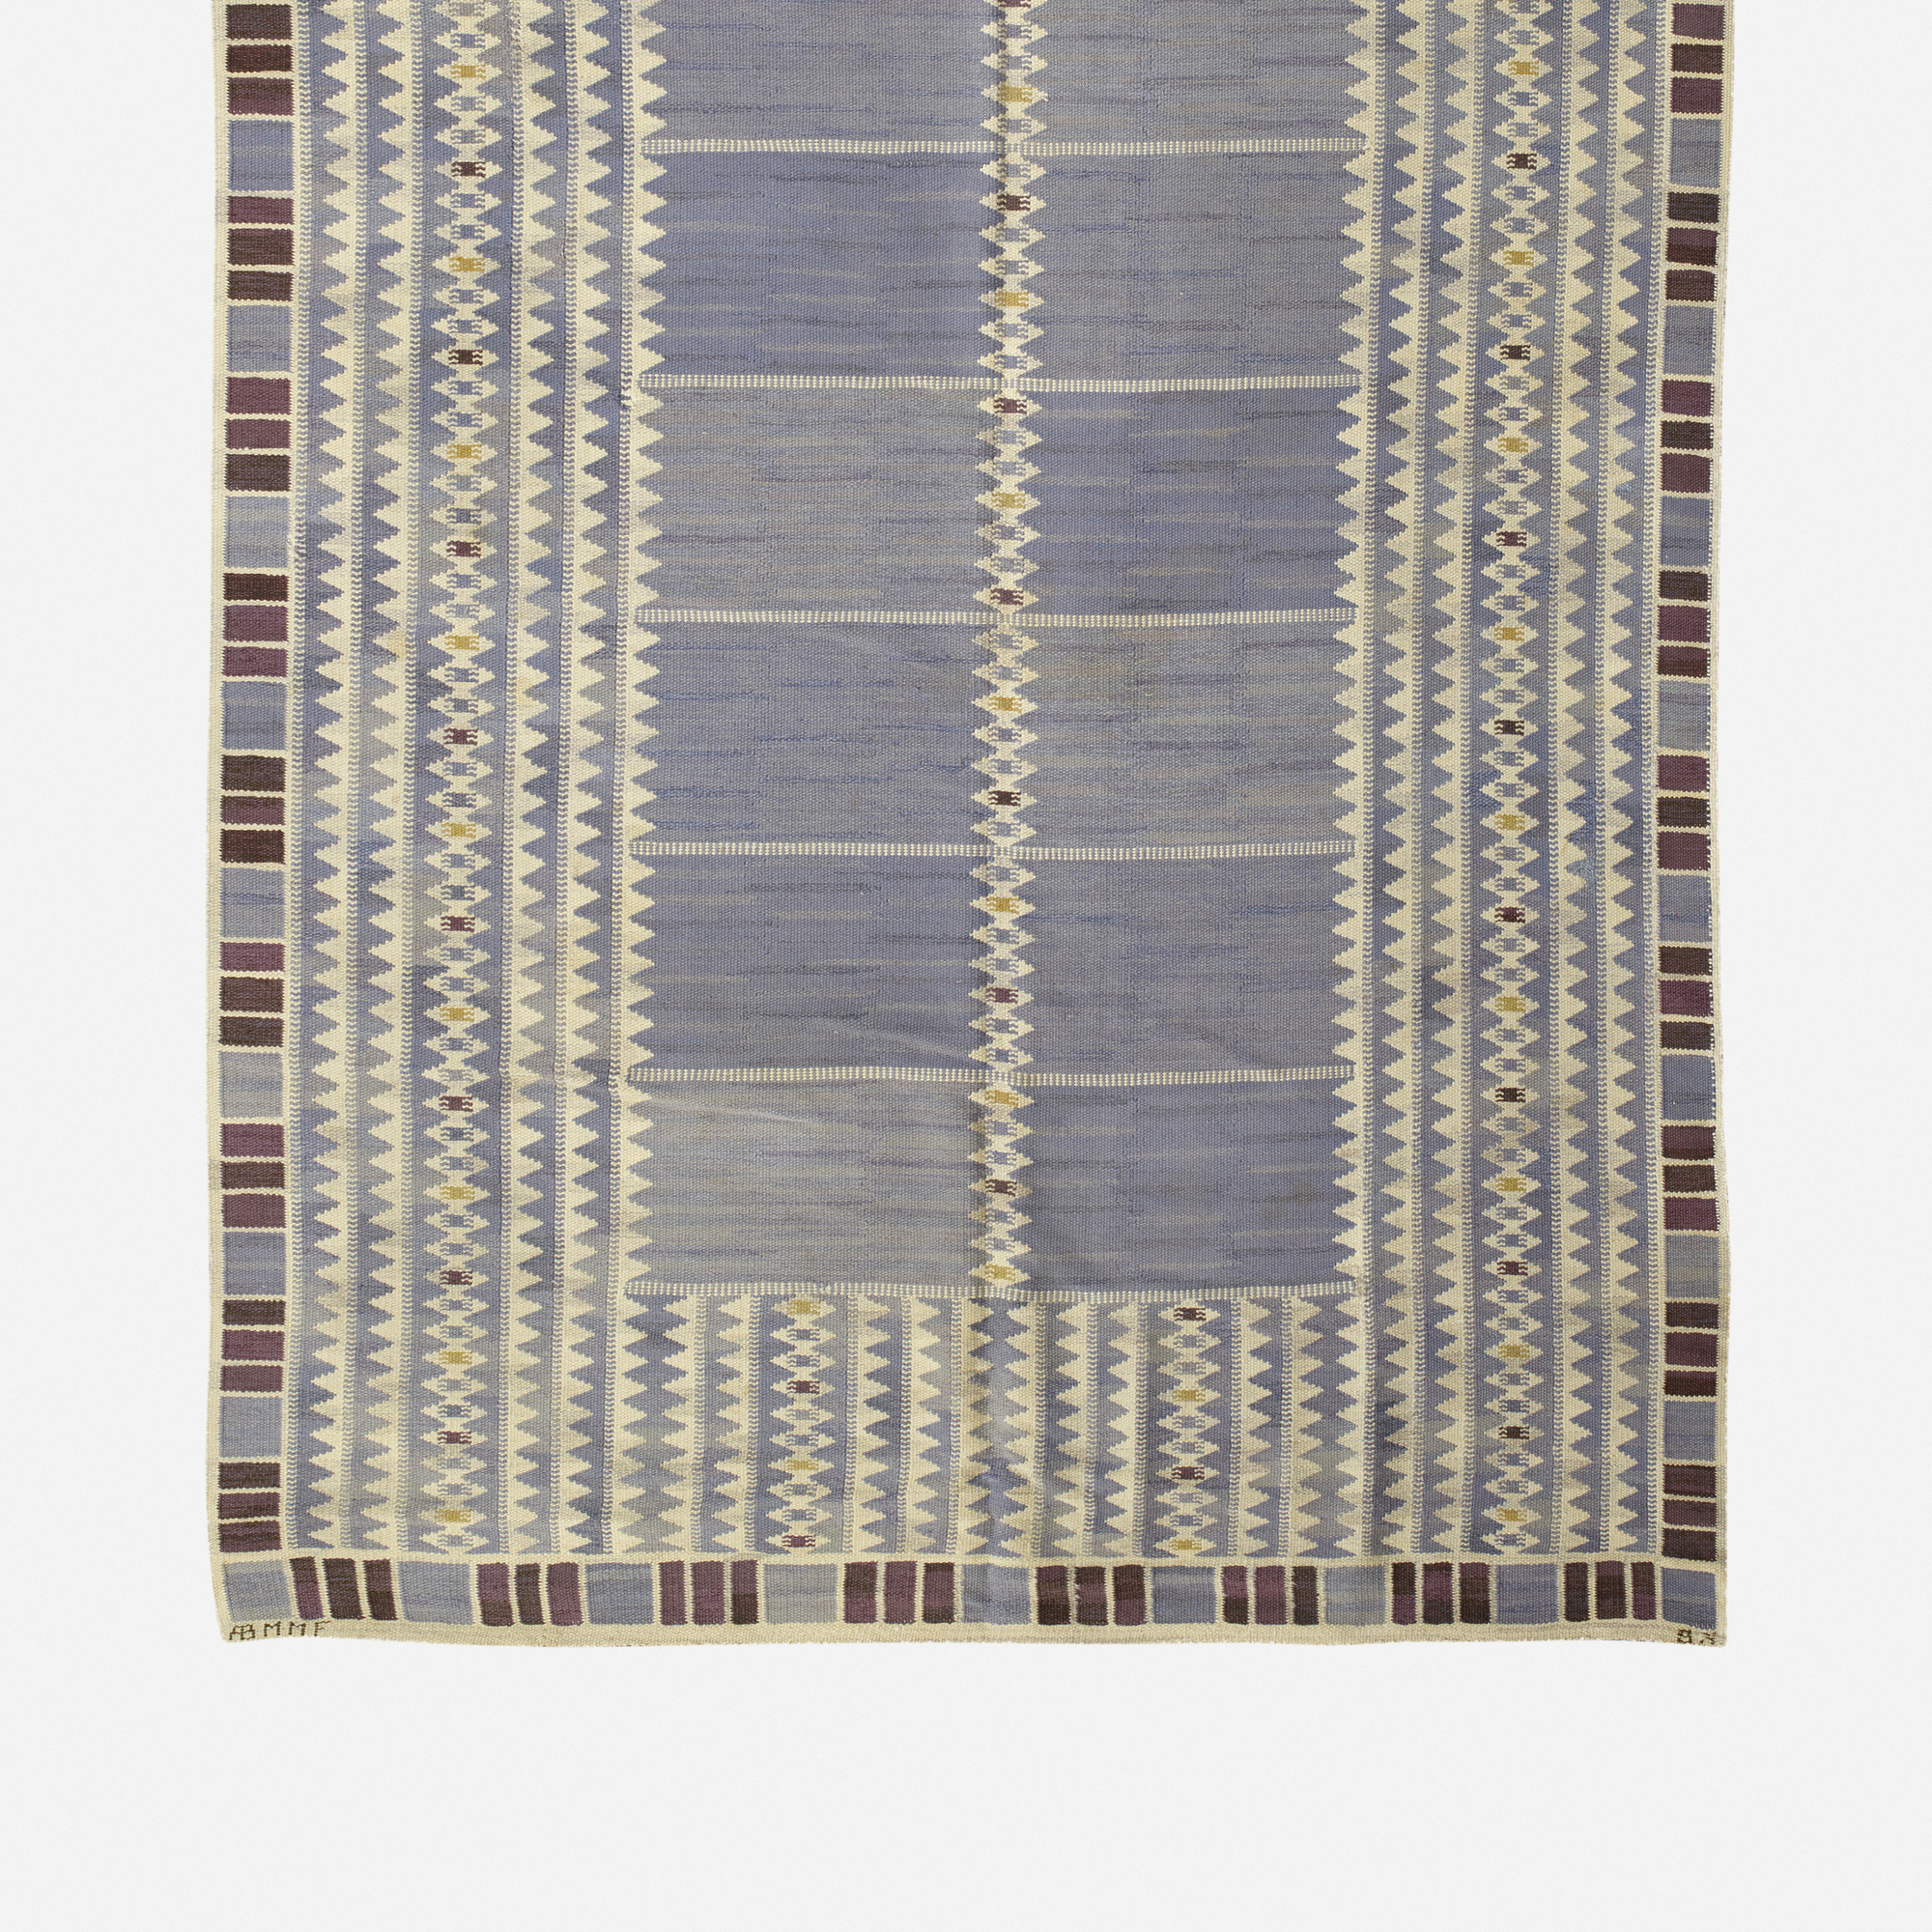 164: Barbro Nilsson / Salerno flatweave carpet (2 of 2)